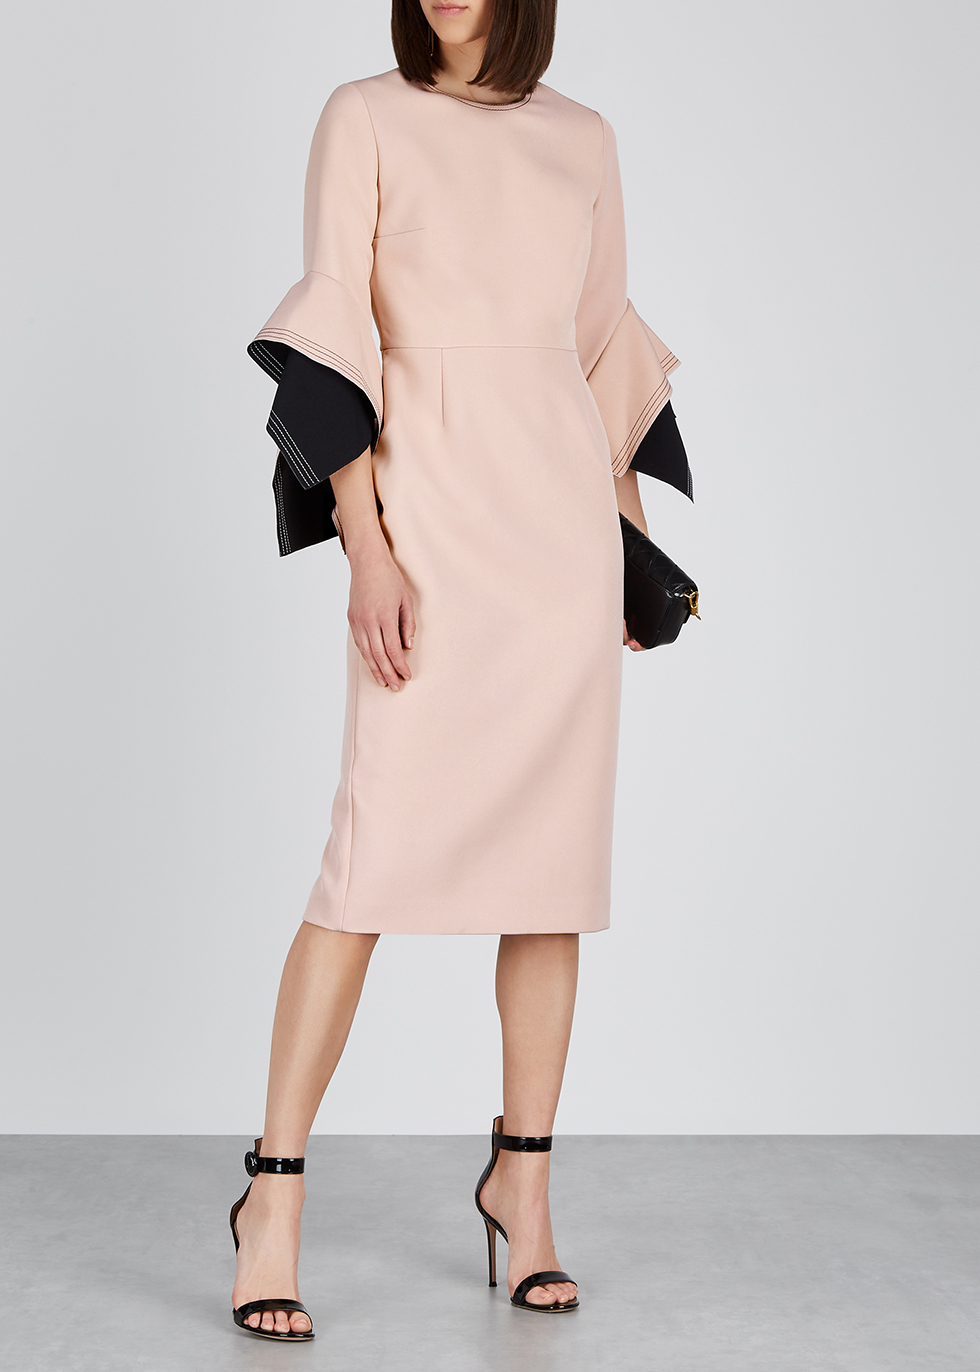 Ronda dusky pink origami-sleeve dress - Roksanda